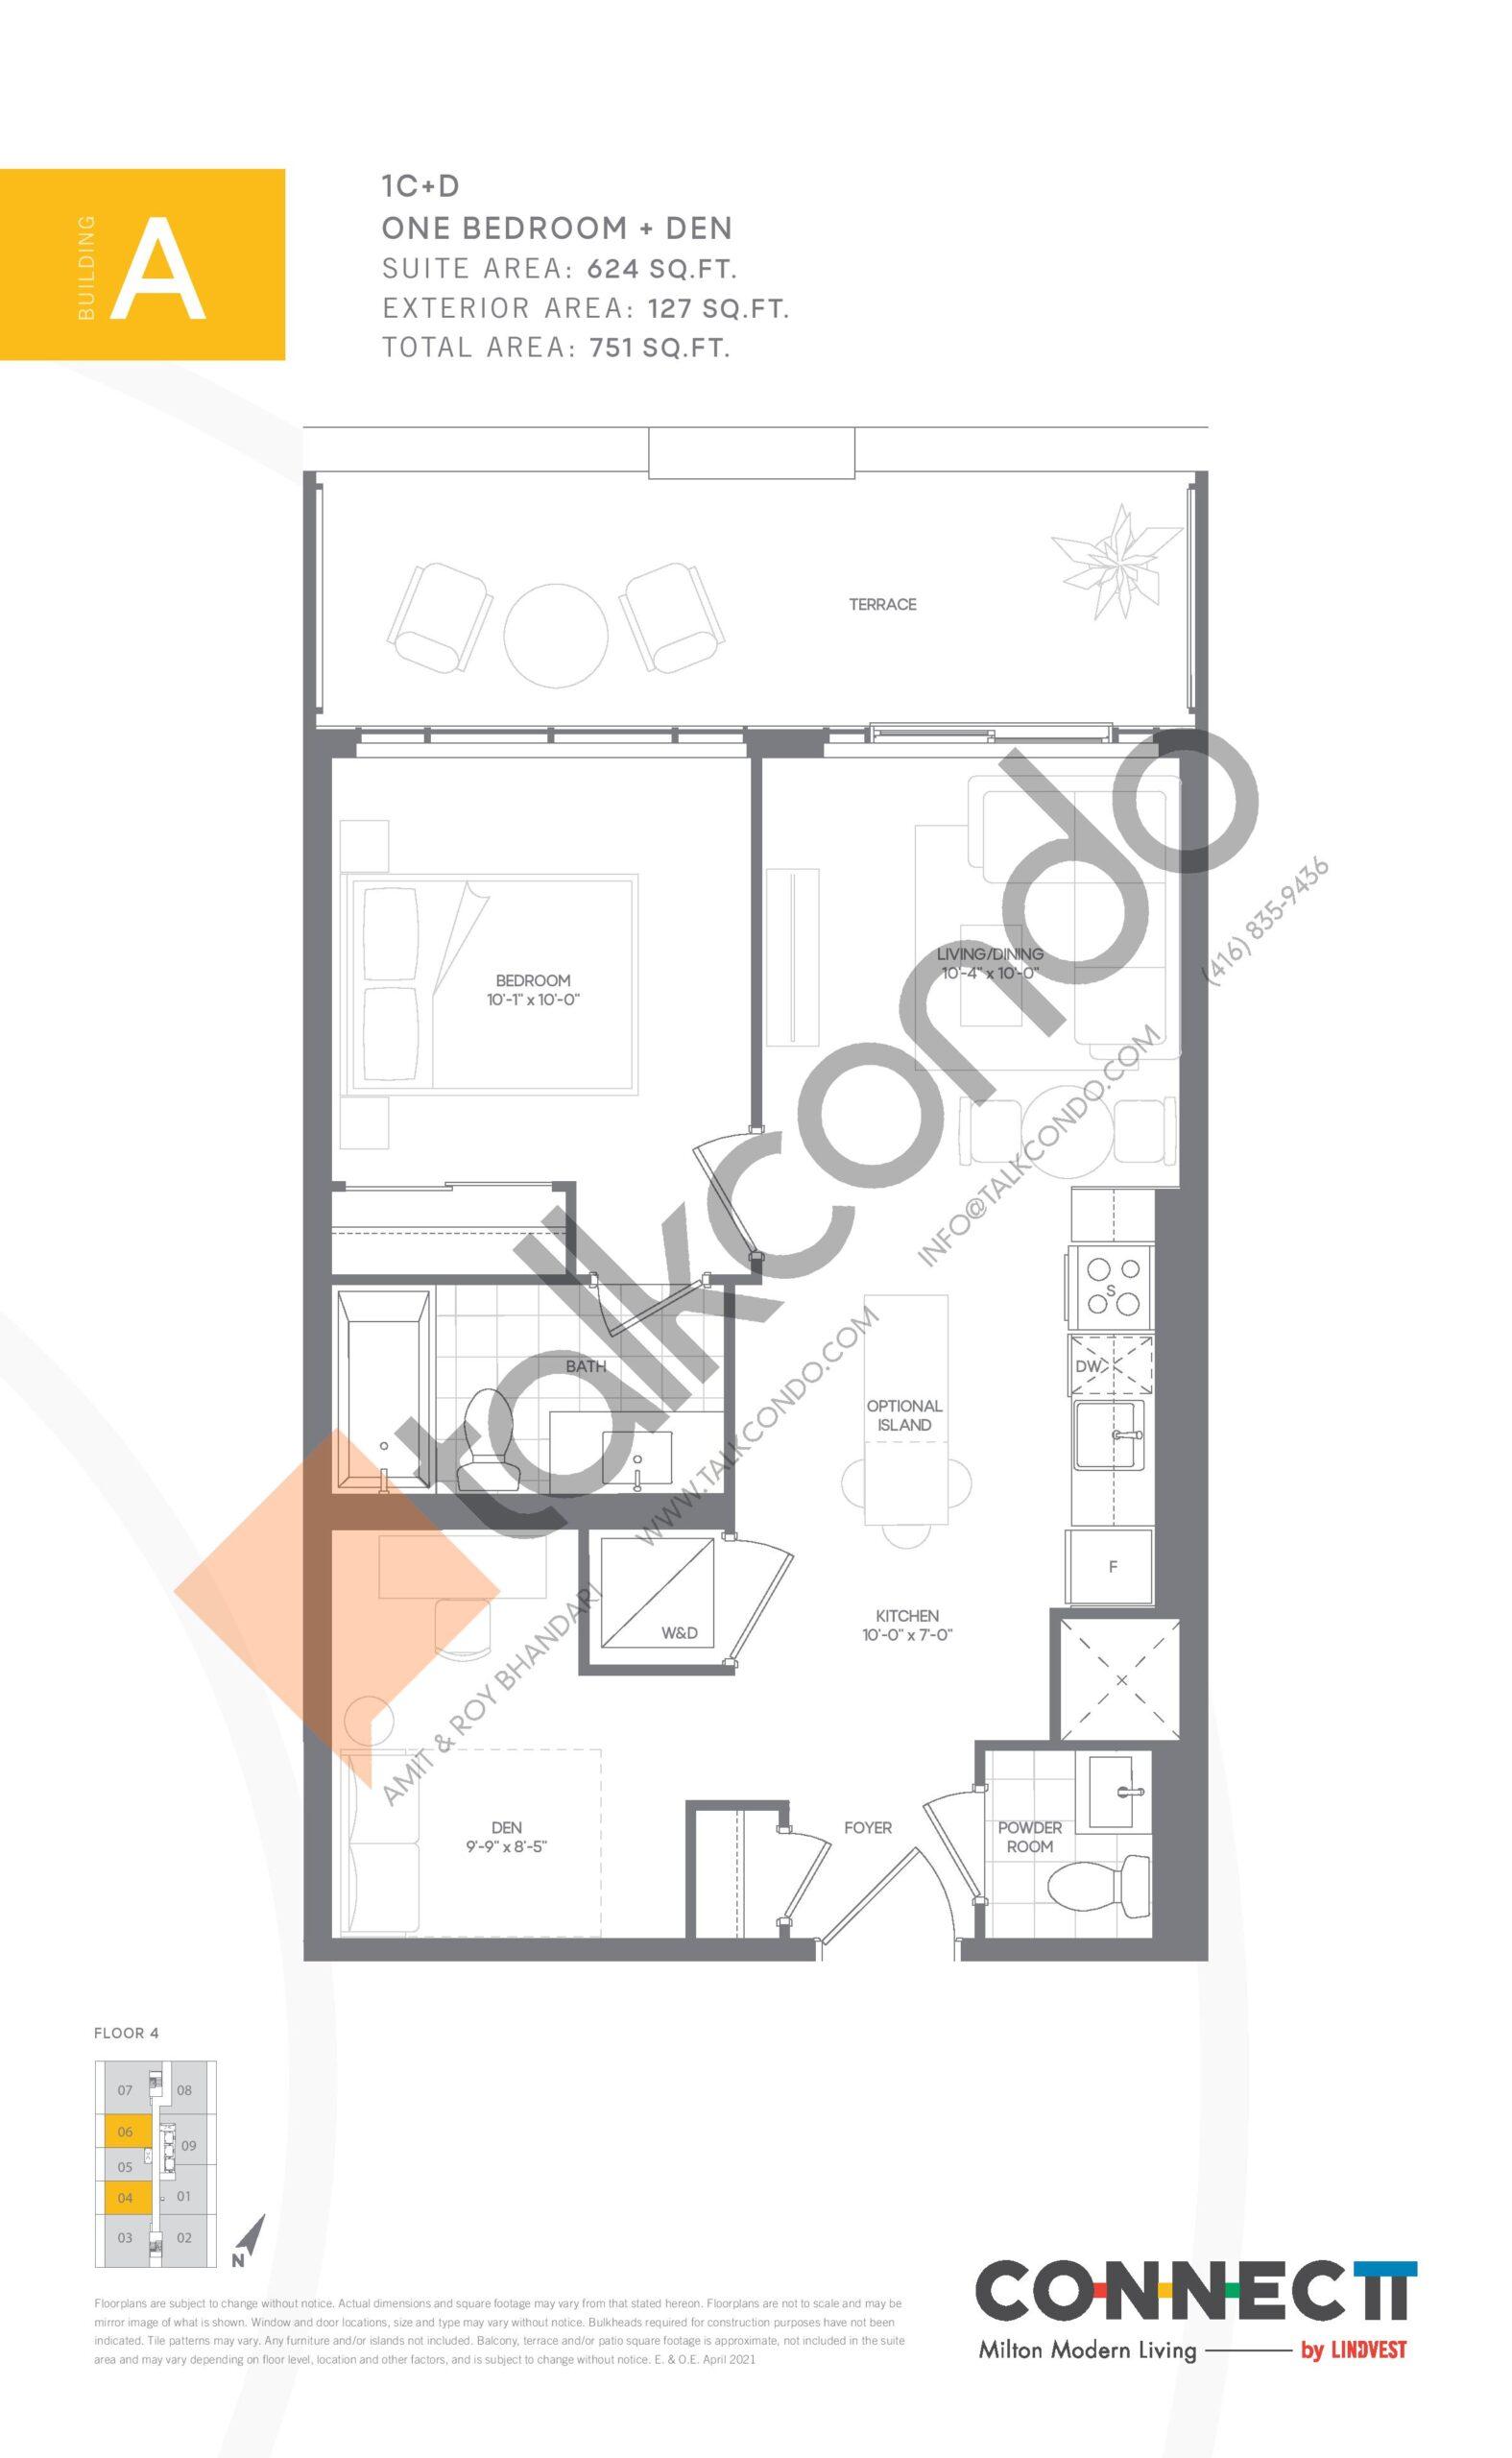 1C+D Floor Plan at Connectt Urban Community Condos - 624 sq.ft